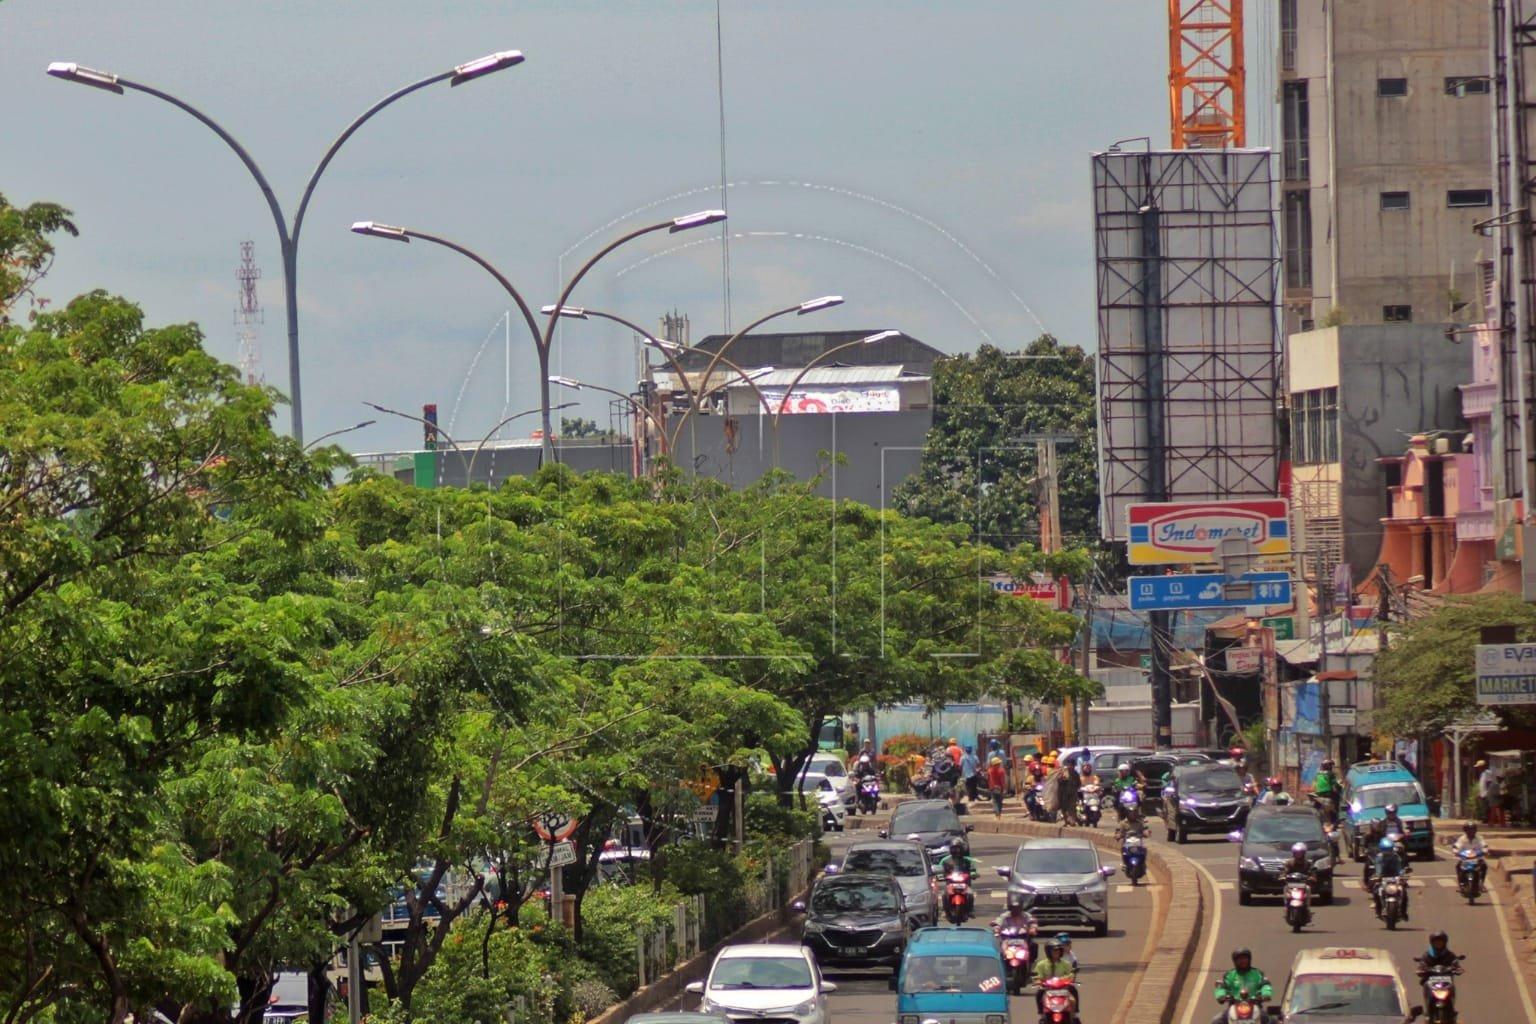 Penerangan Jalan di Kota Depok Harus Merata